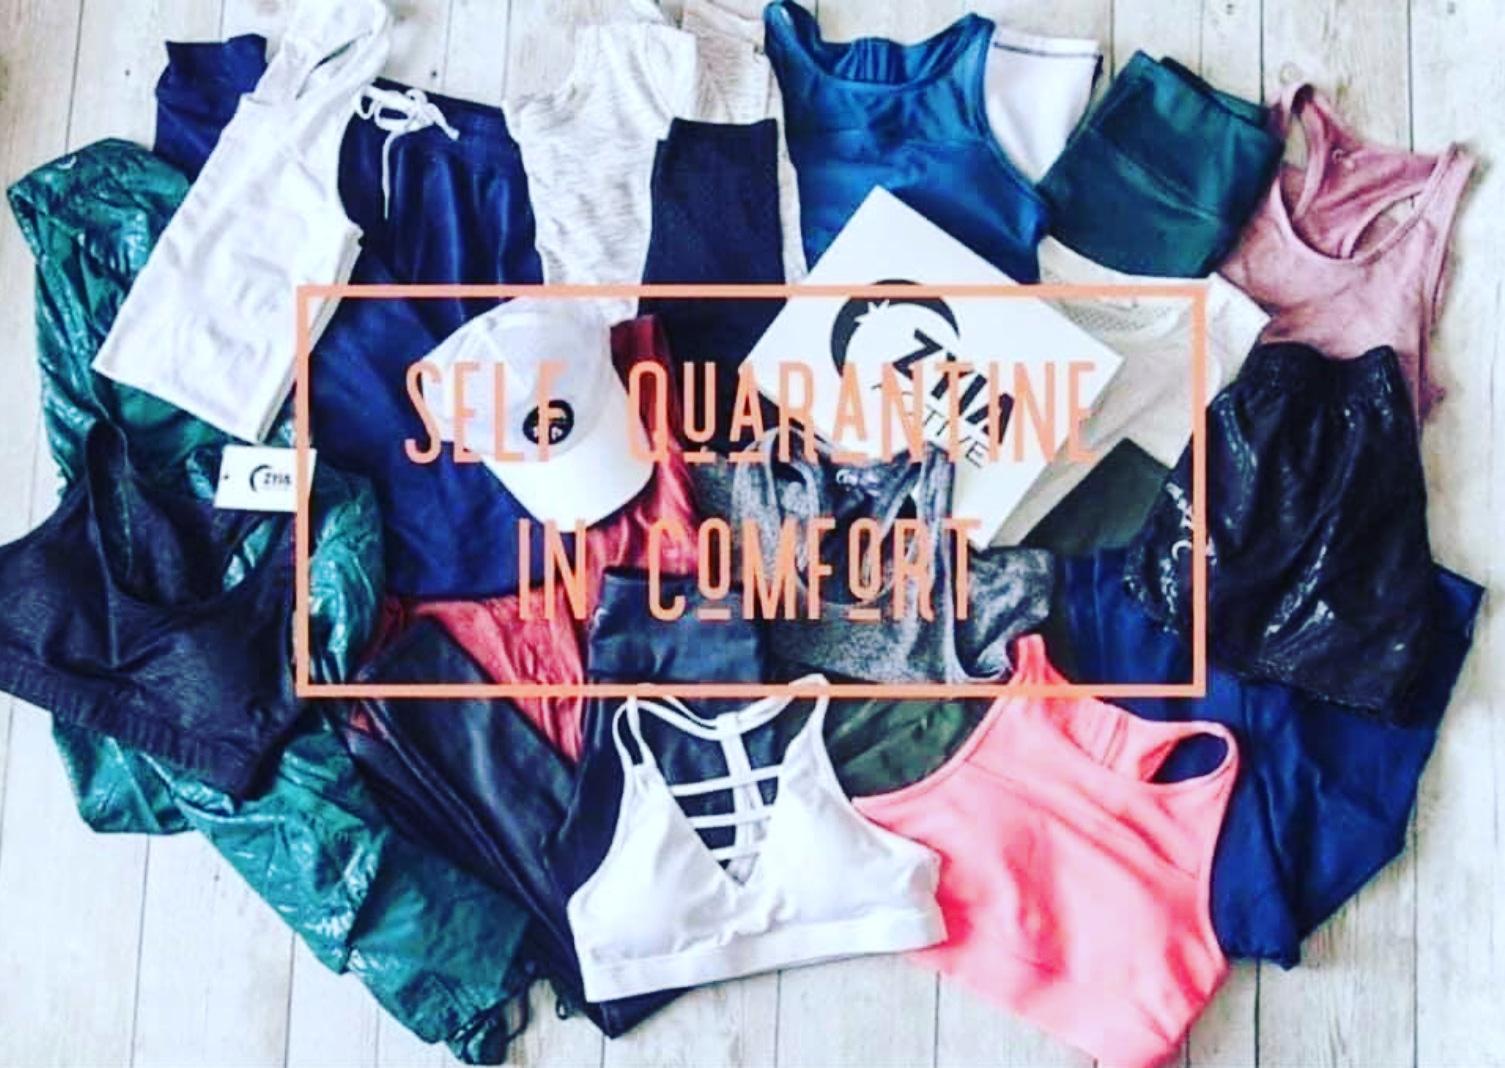 #zyiaactive #jaciscottmorrow #kalvinarailias #clothingstore #clothes #apparel #sportswear #menswear #womenswear